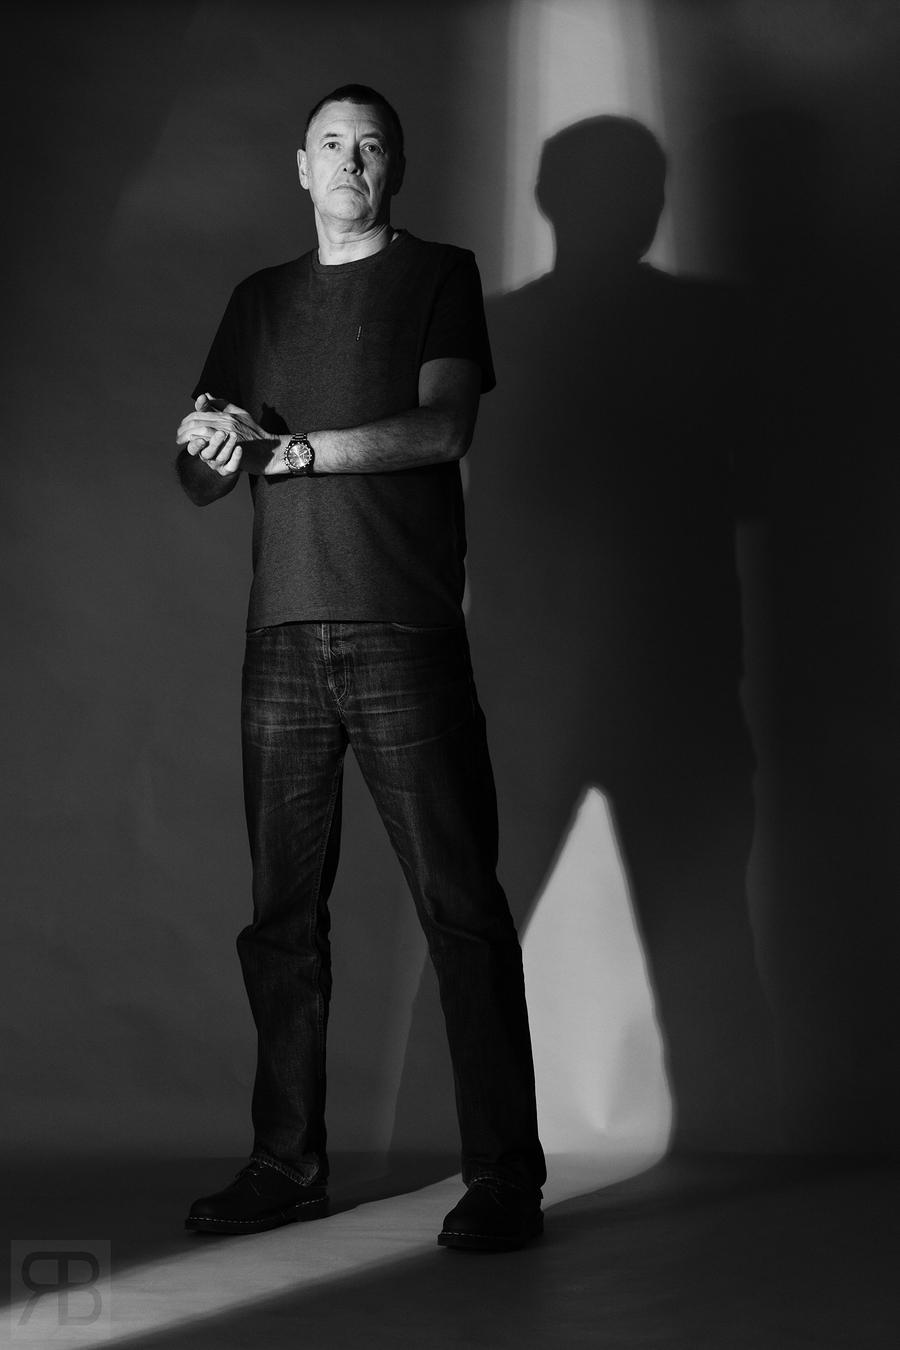 #makeportraits - Stuart / Photography by RJ Bradbury Photography Studio, Model Stuart1, Taken at RJ Bradbury Photography Studio / Uploaded 4th May 2019 @ 10:41 AM